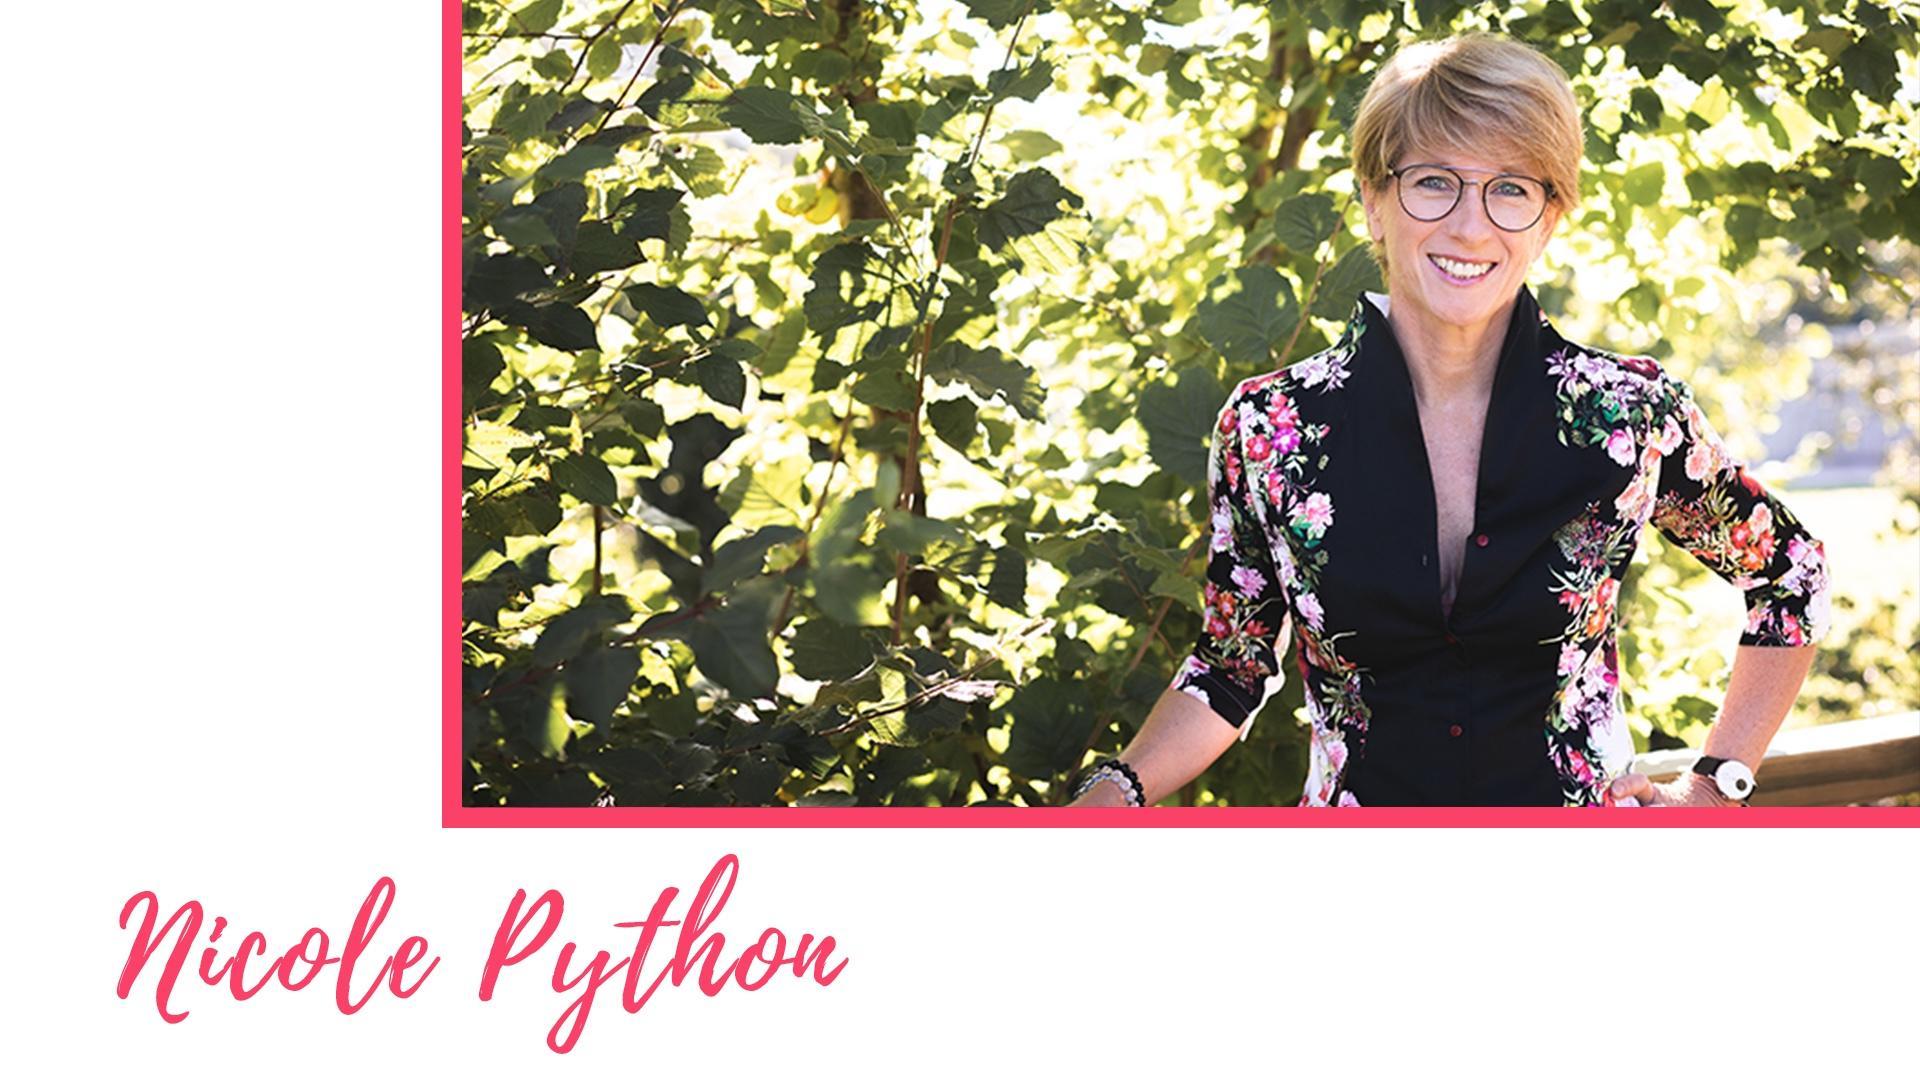 Nicole Python - Let it Be